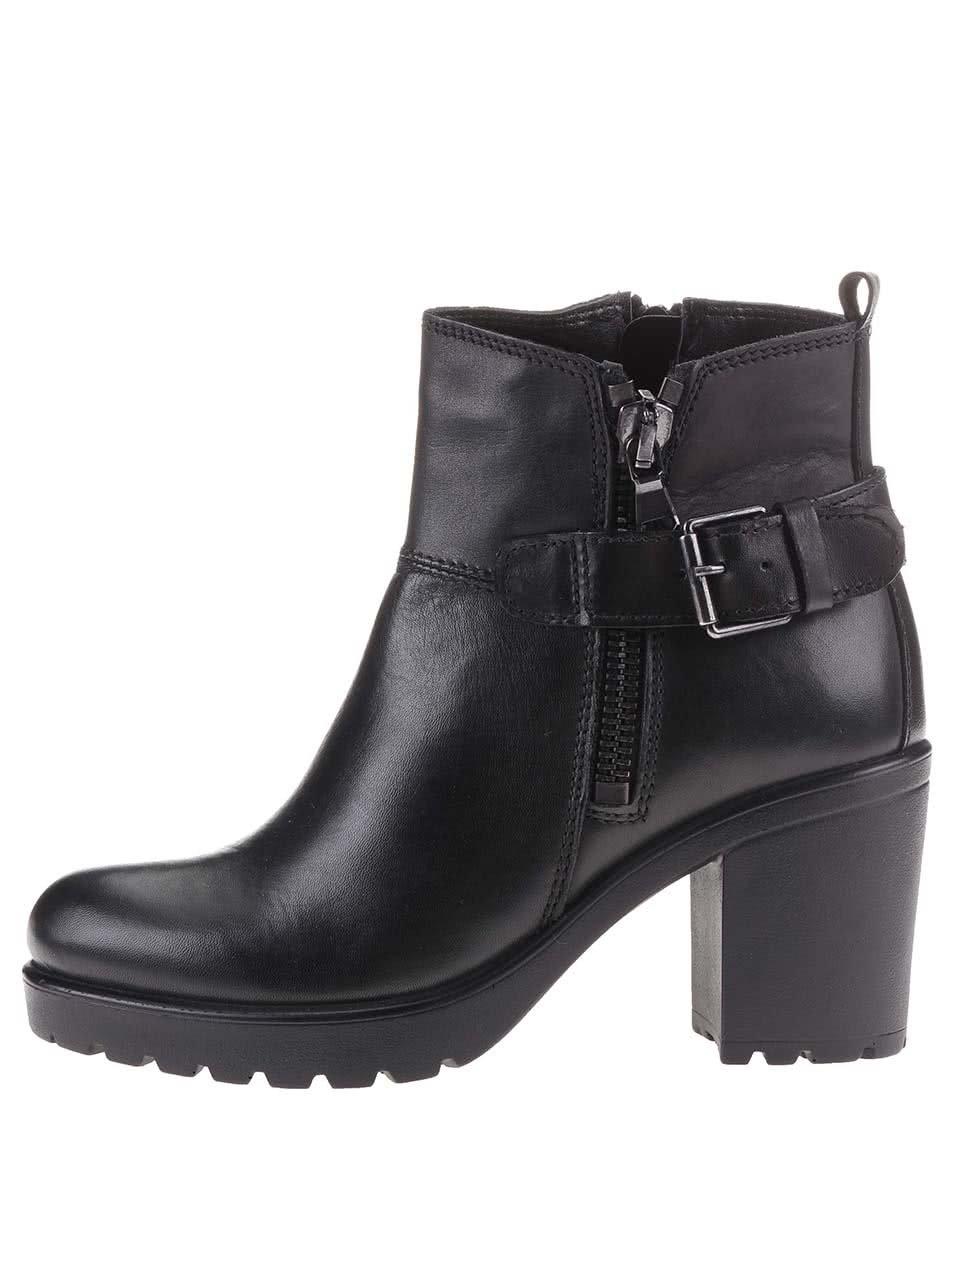 Čierne dámske kožené členkové topánky na širšom podpätku s.Oliver ... 31cdc315cfa